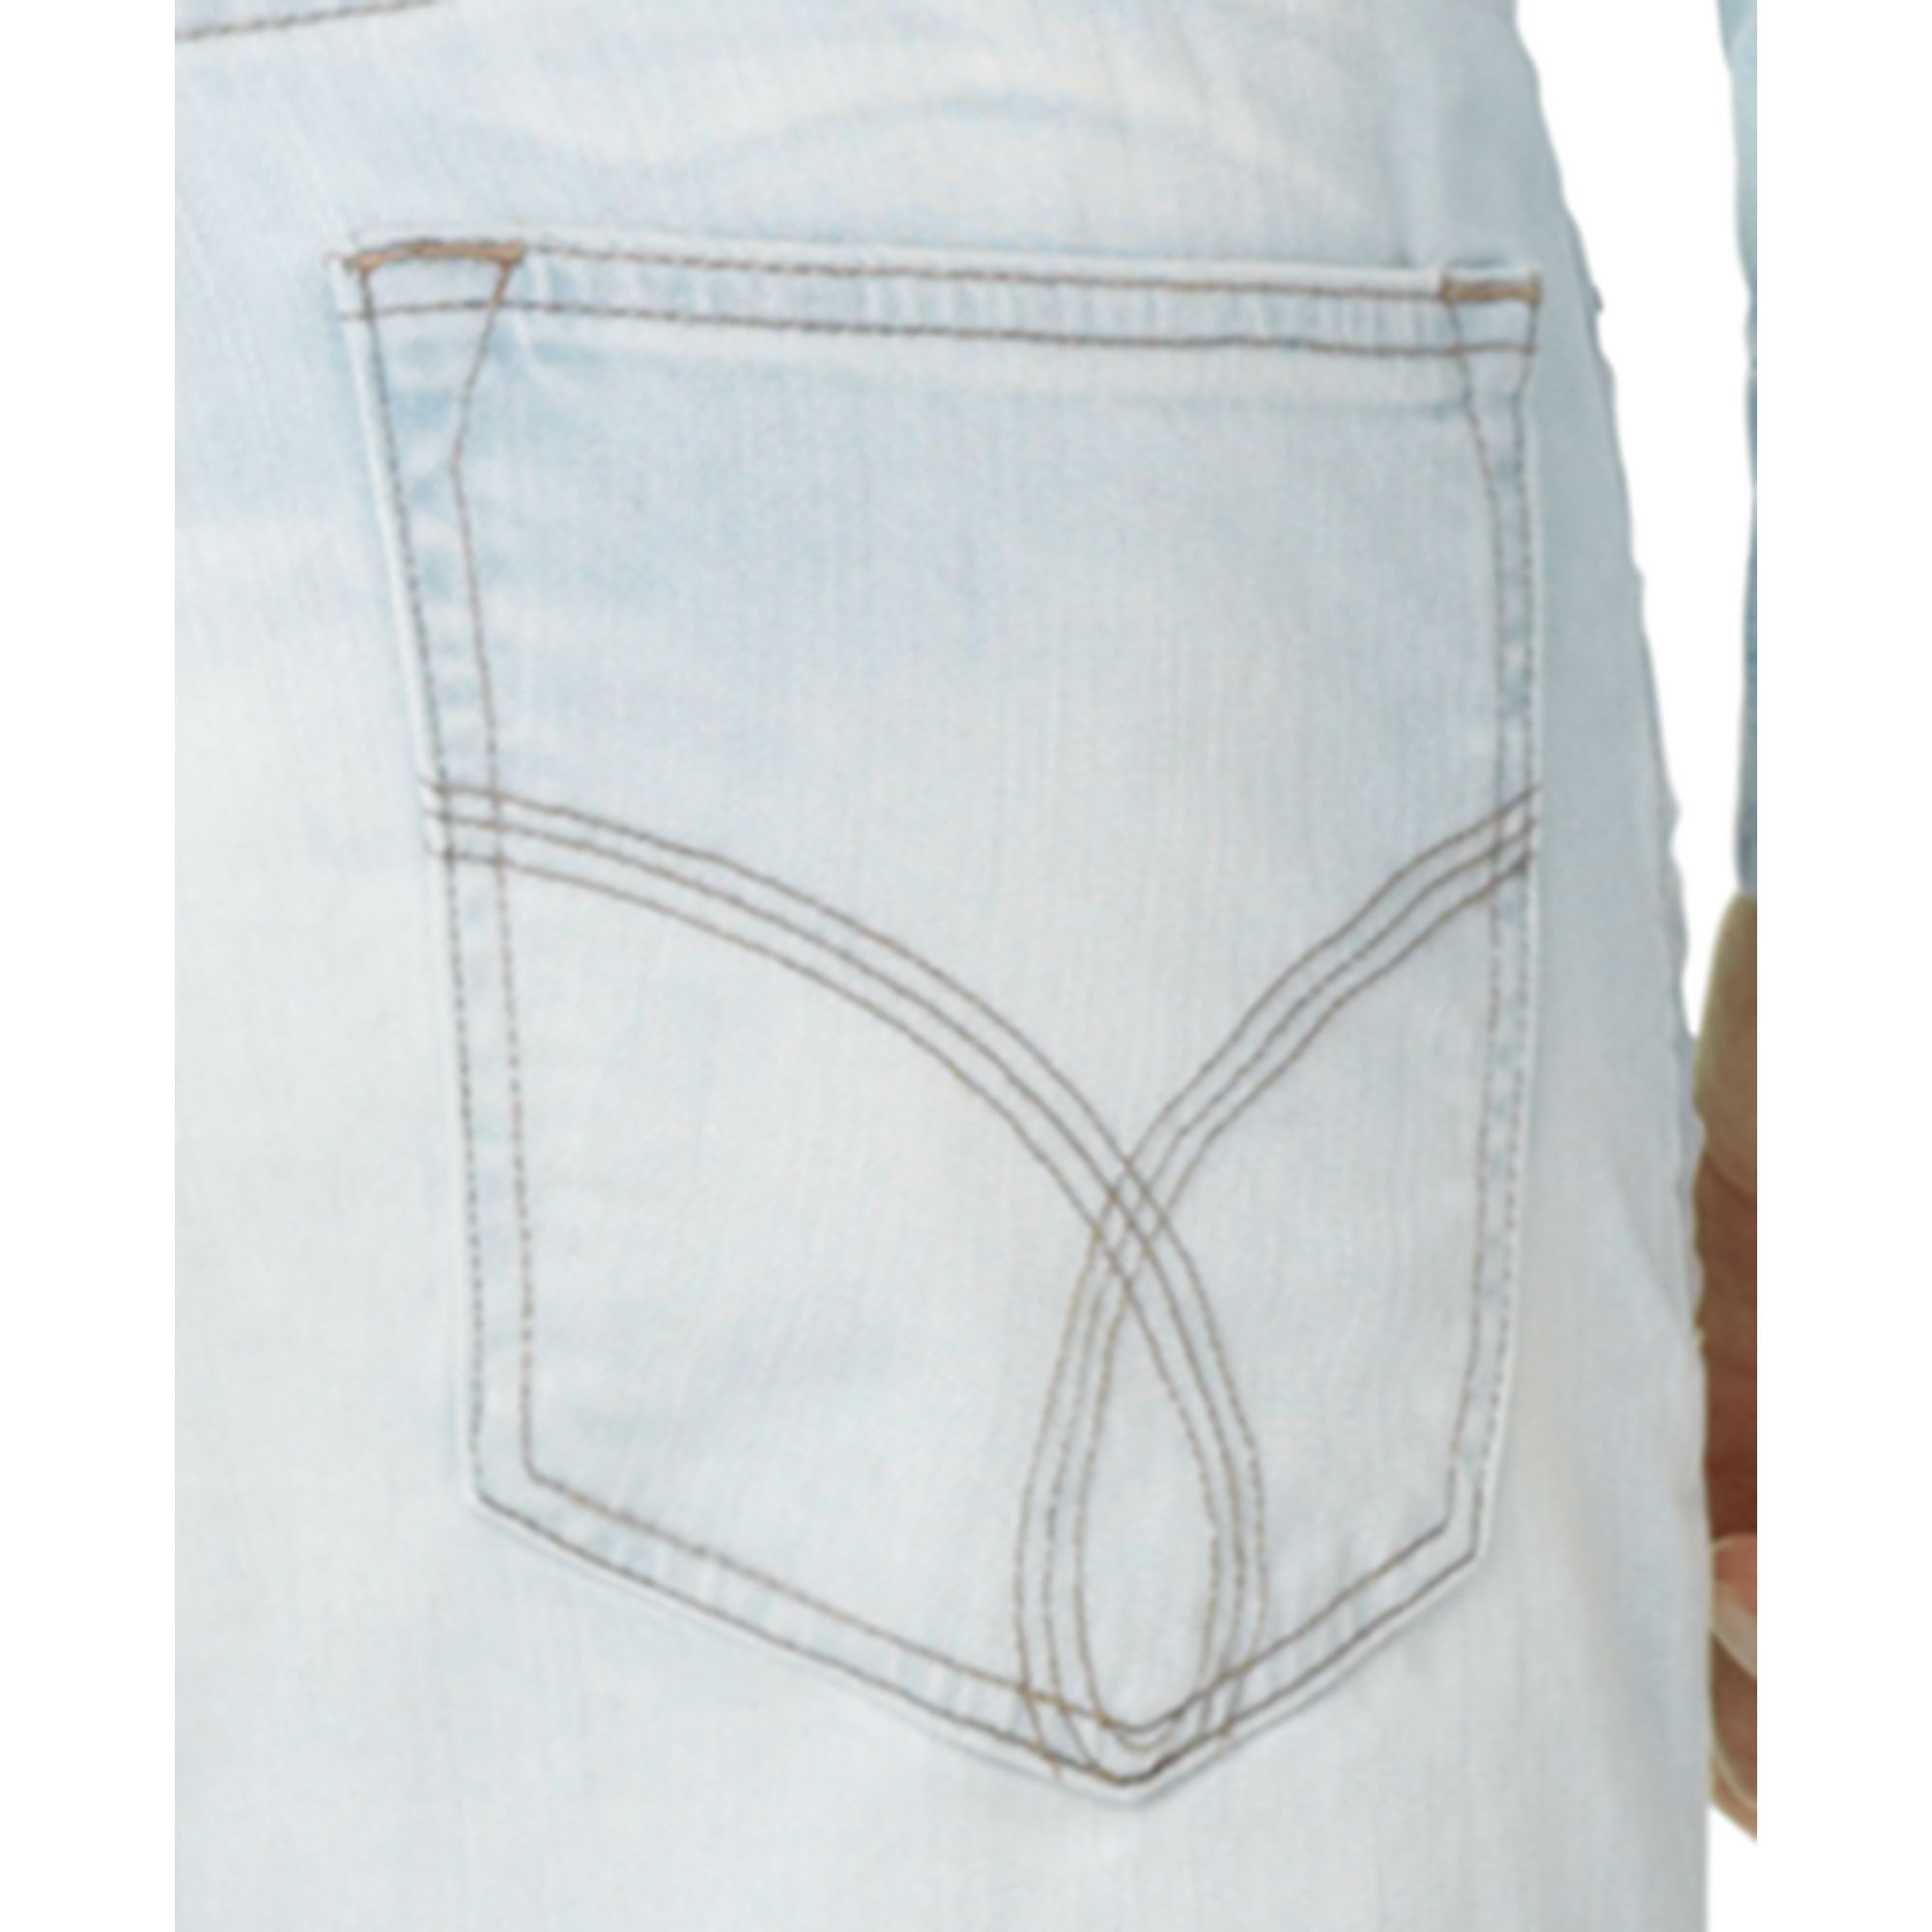 calvin klein jeans slim straight jeans in blue for men lyst. Black Bedroom Furniture Sets. Home Design Ideas